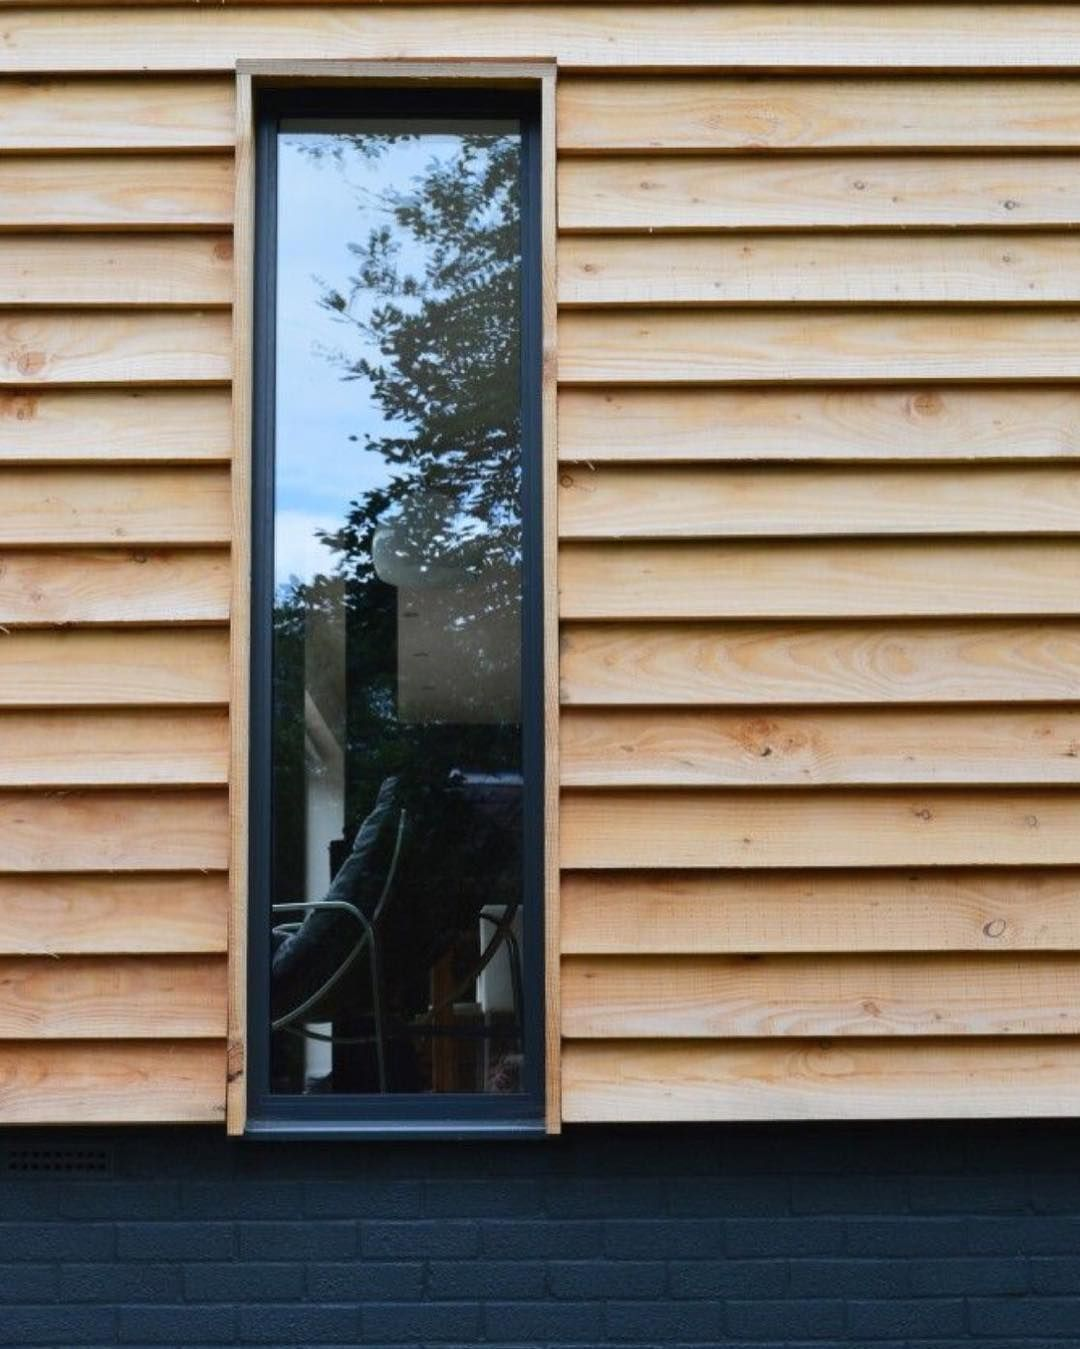 Ver Esta Foto Do Instagram De Thelocalproject 1 960 Curtidas House Cladding Timber Cladding Wood Facade